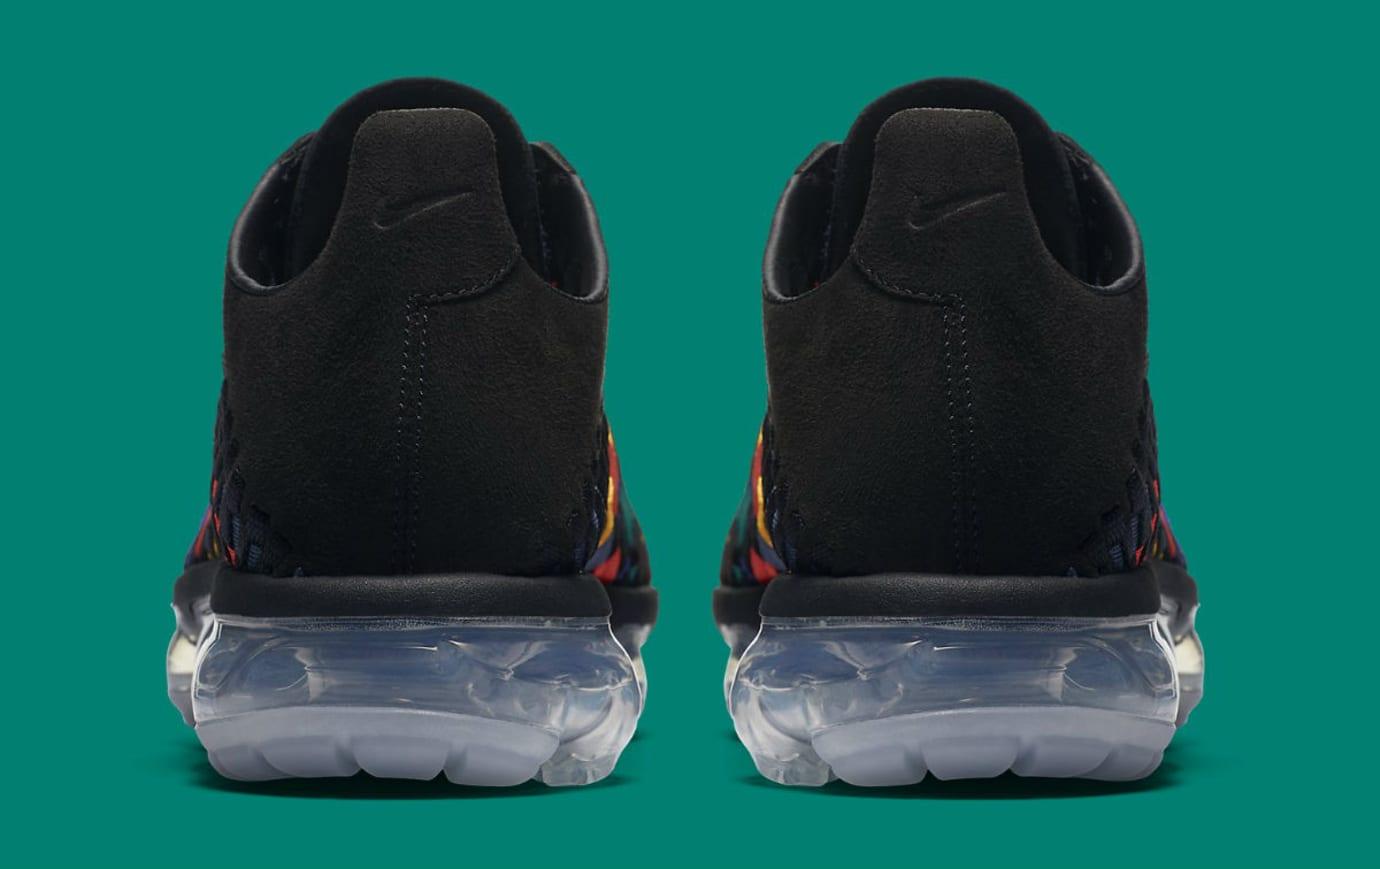 Nike Air VaporMax Inneva Multicolor Release Date AO2447-001 Heel